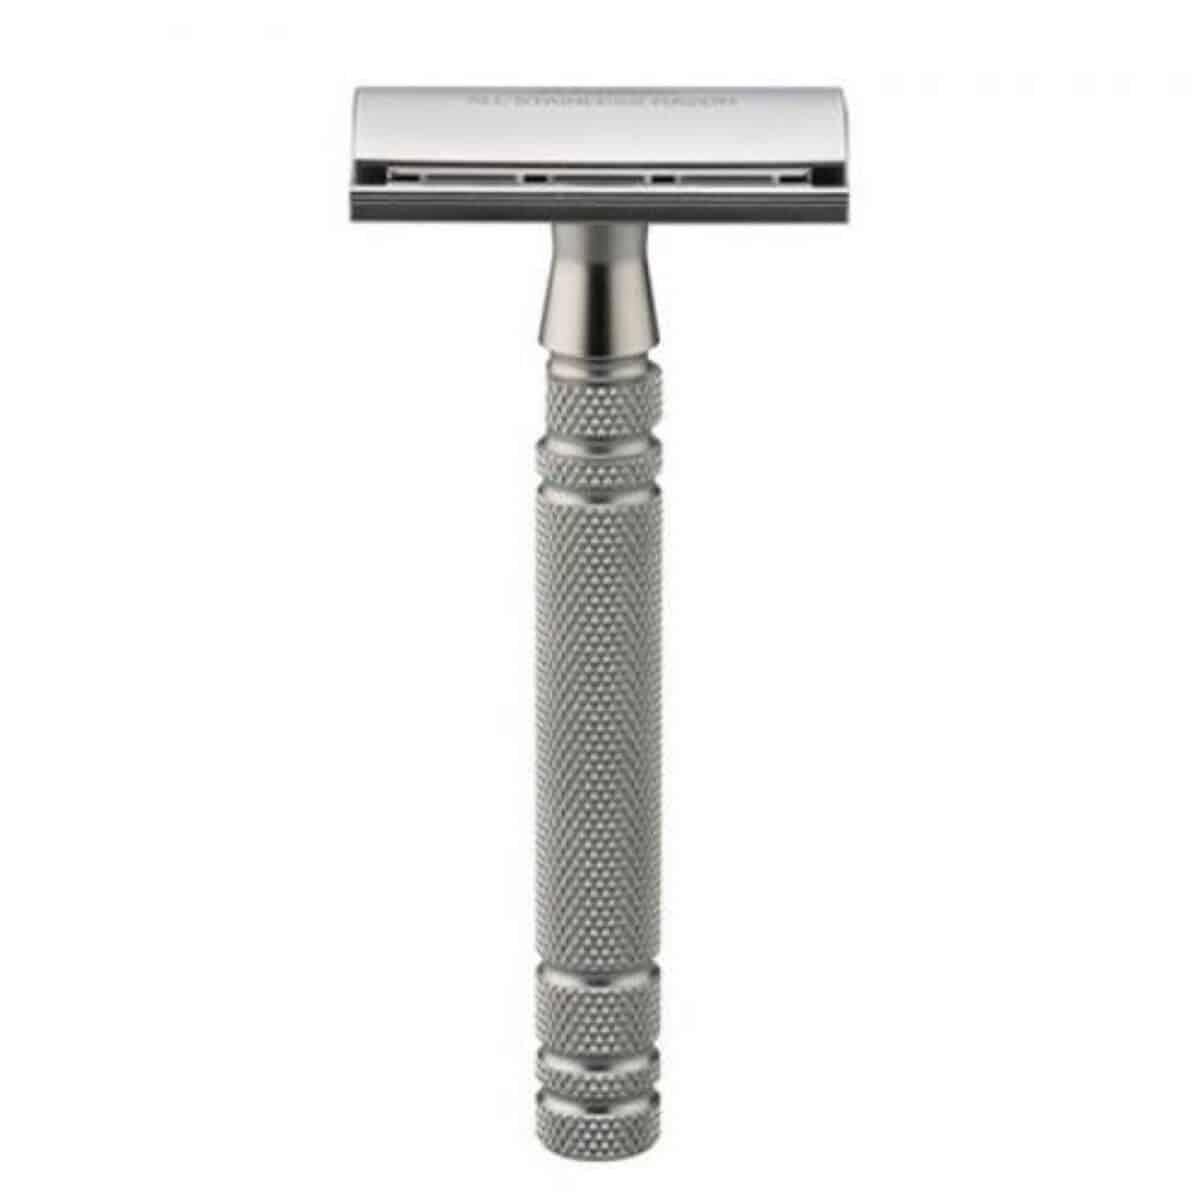 Feather safety razor.